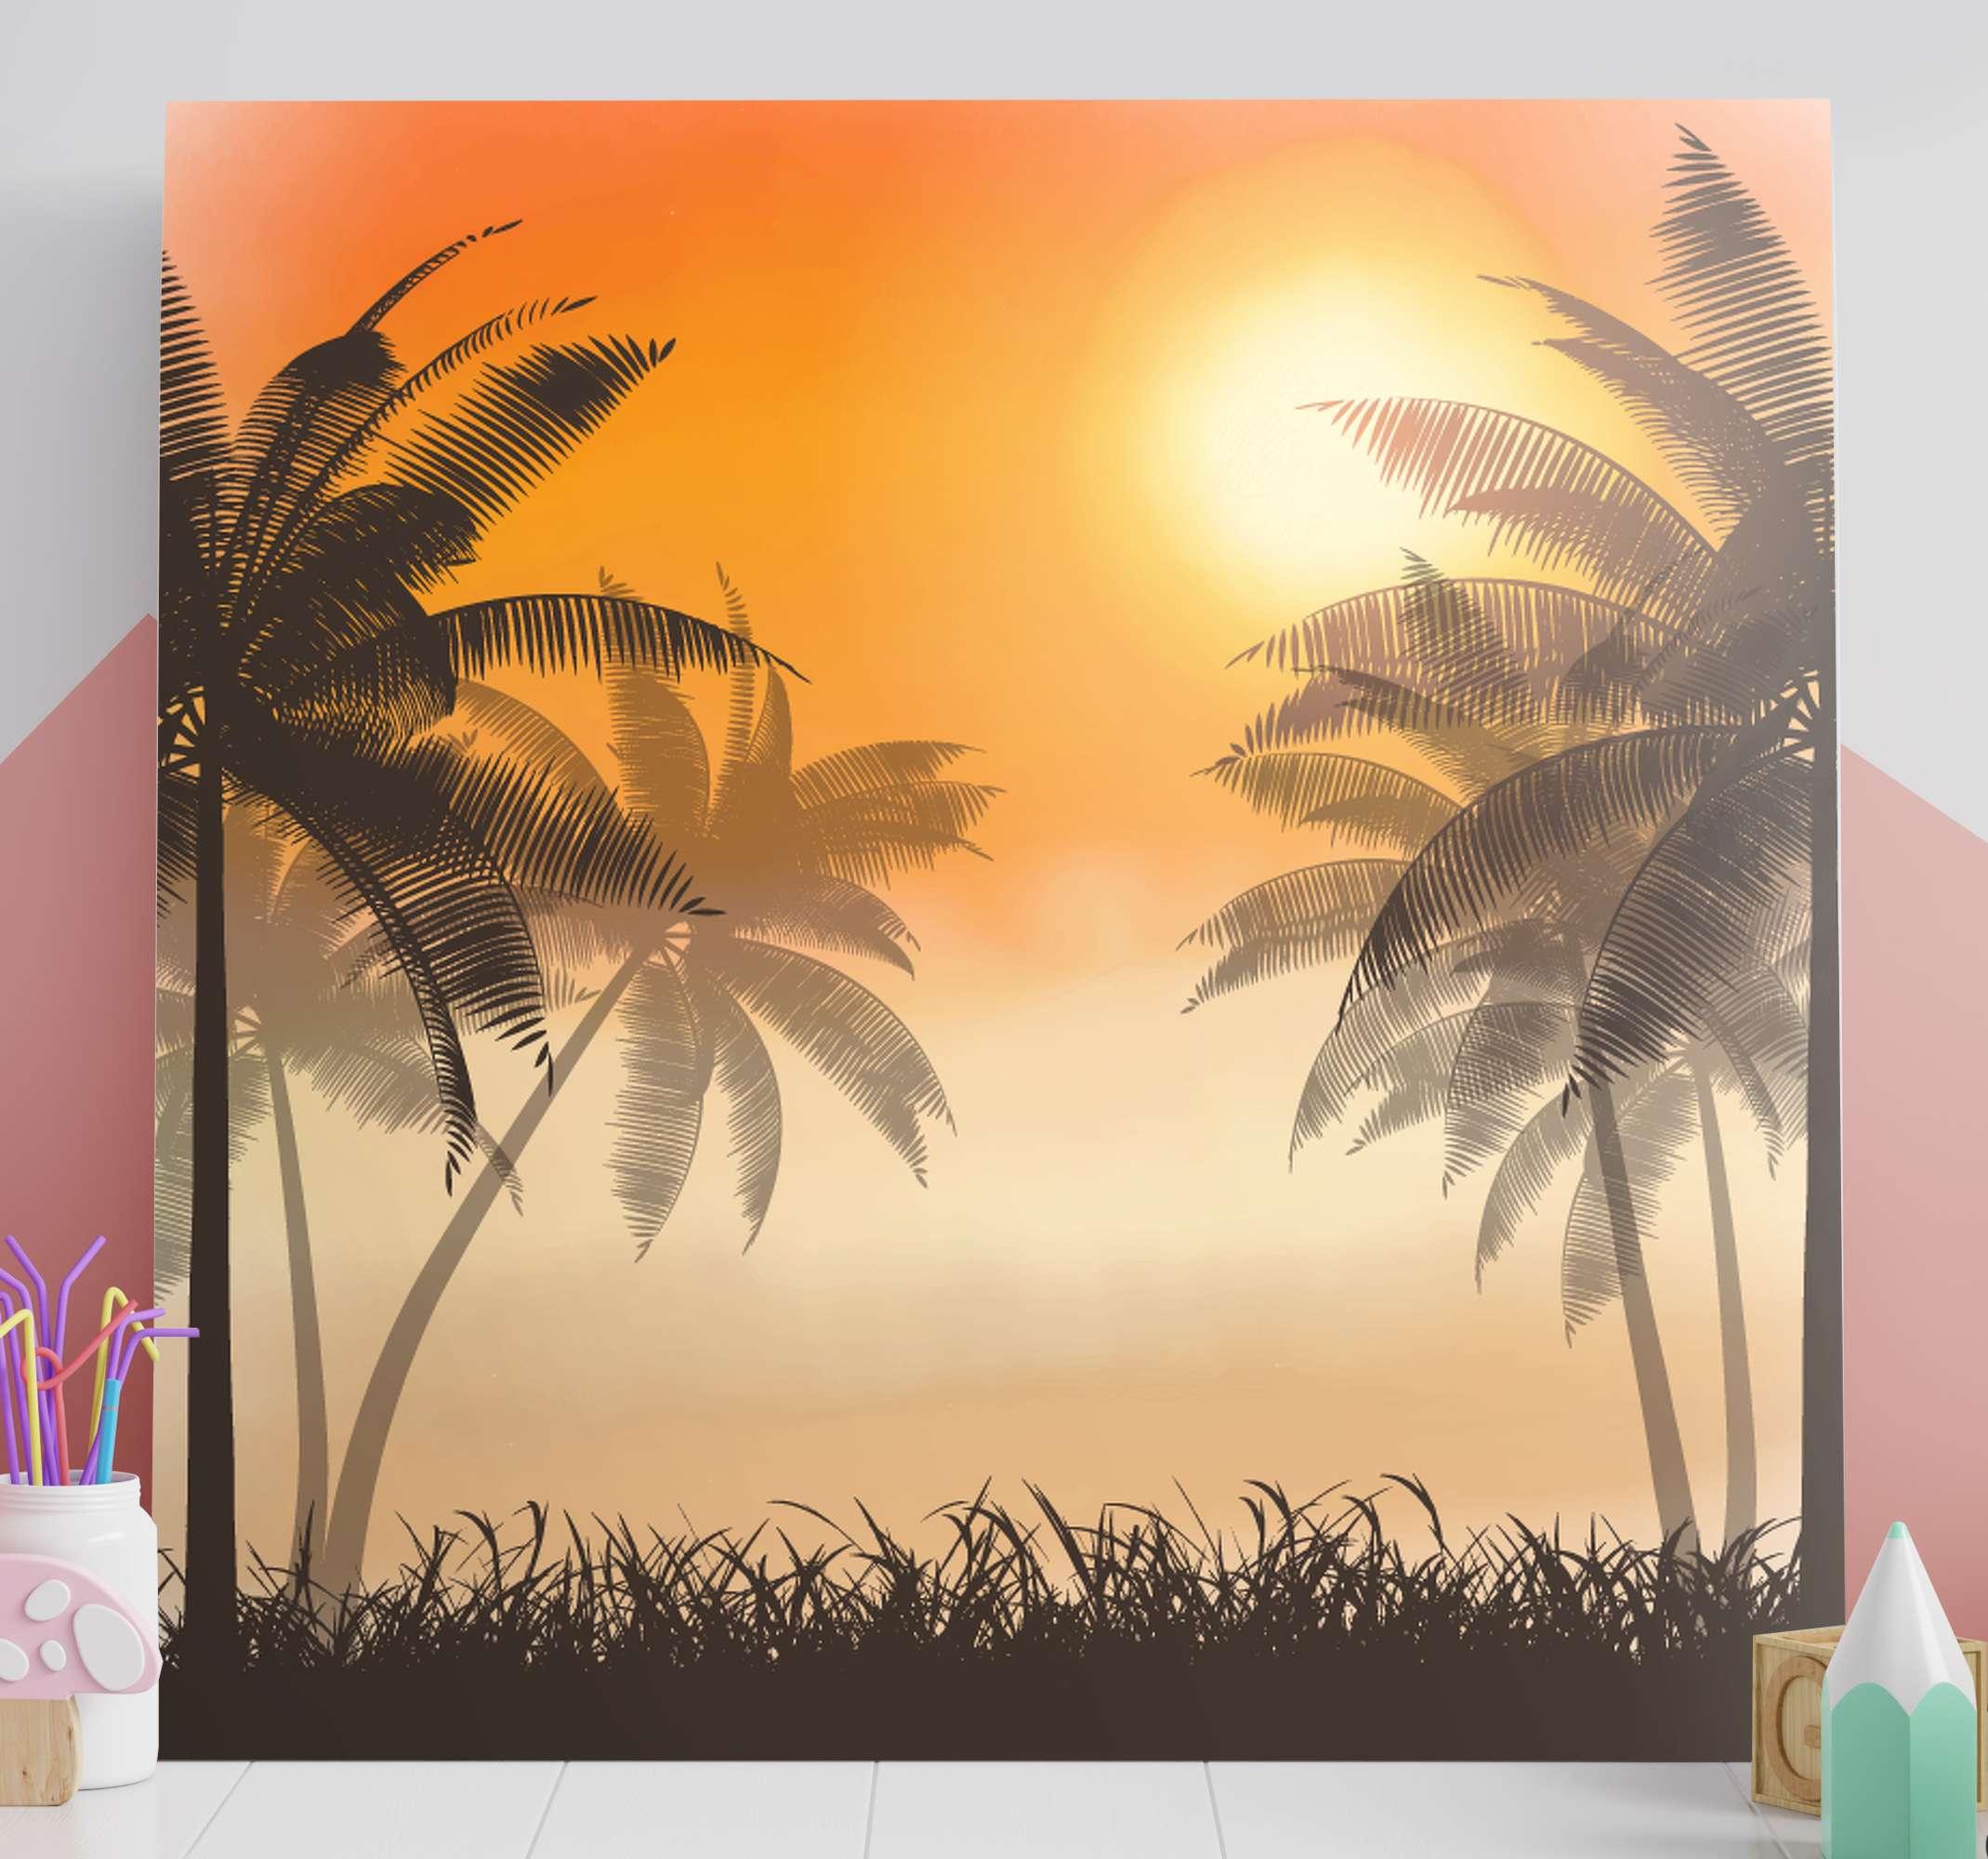 TenStickers. 日落风景帆布墙艺术. 一棵舒缓的棕榈树,带有日落风景帆布壁画。这是用于客厅,办公室和其他首选空间的可爱画布设计。